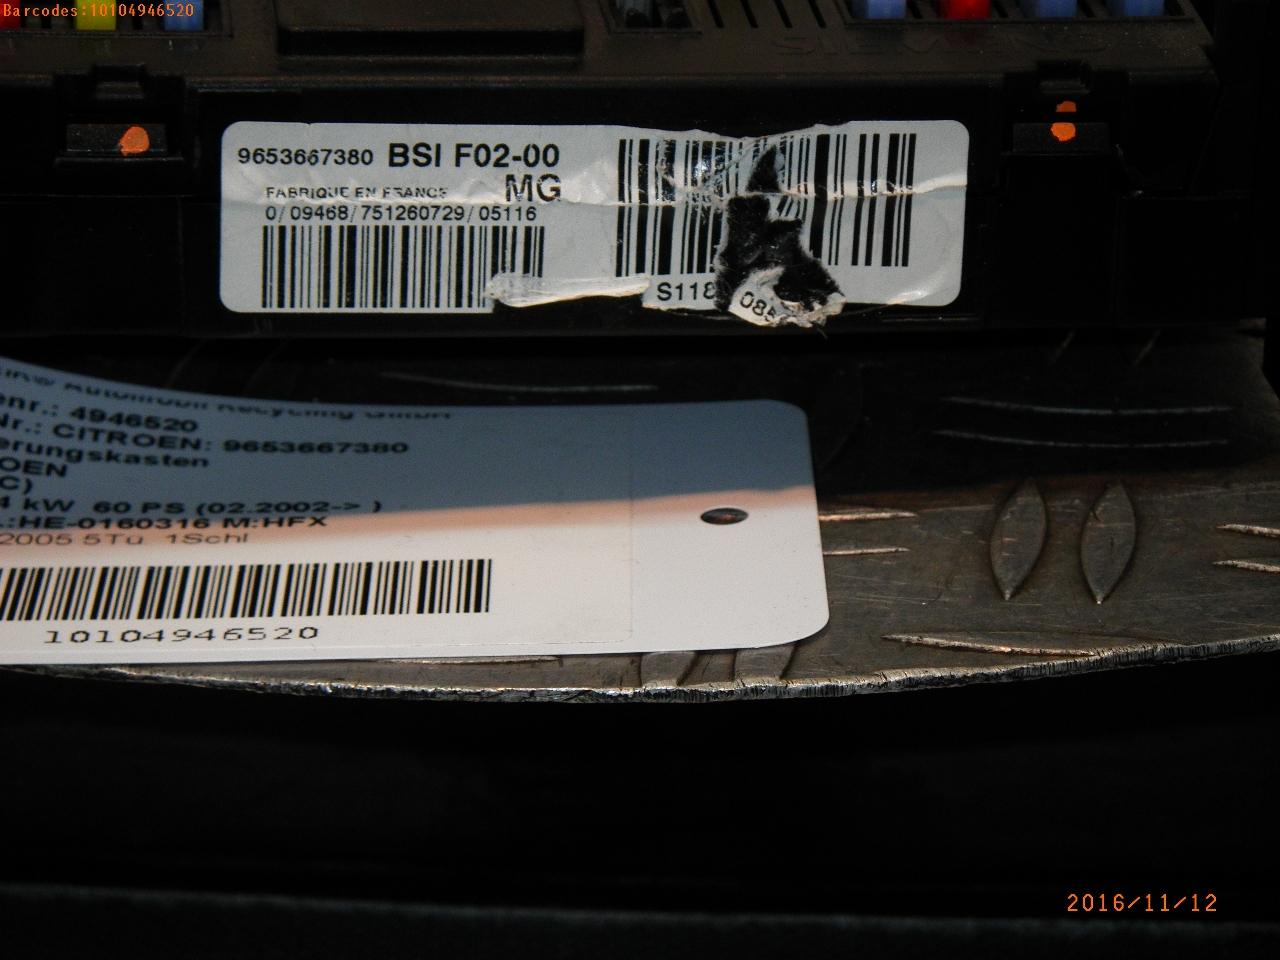 Fuse Box In Citroen C3 Wiring Library Glove 9653667380 Bsif0200mg Zentralelektrik Citron I